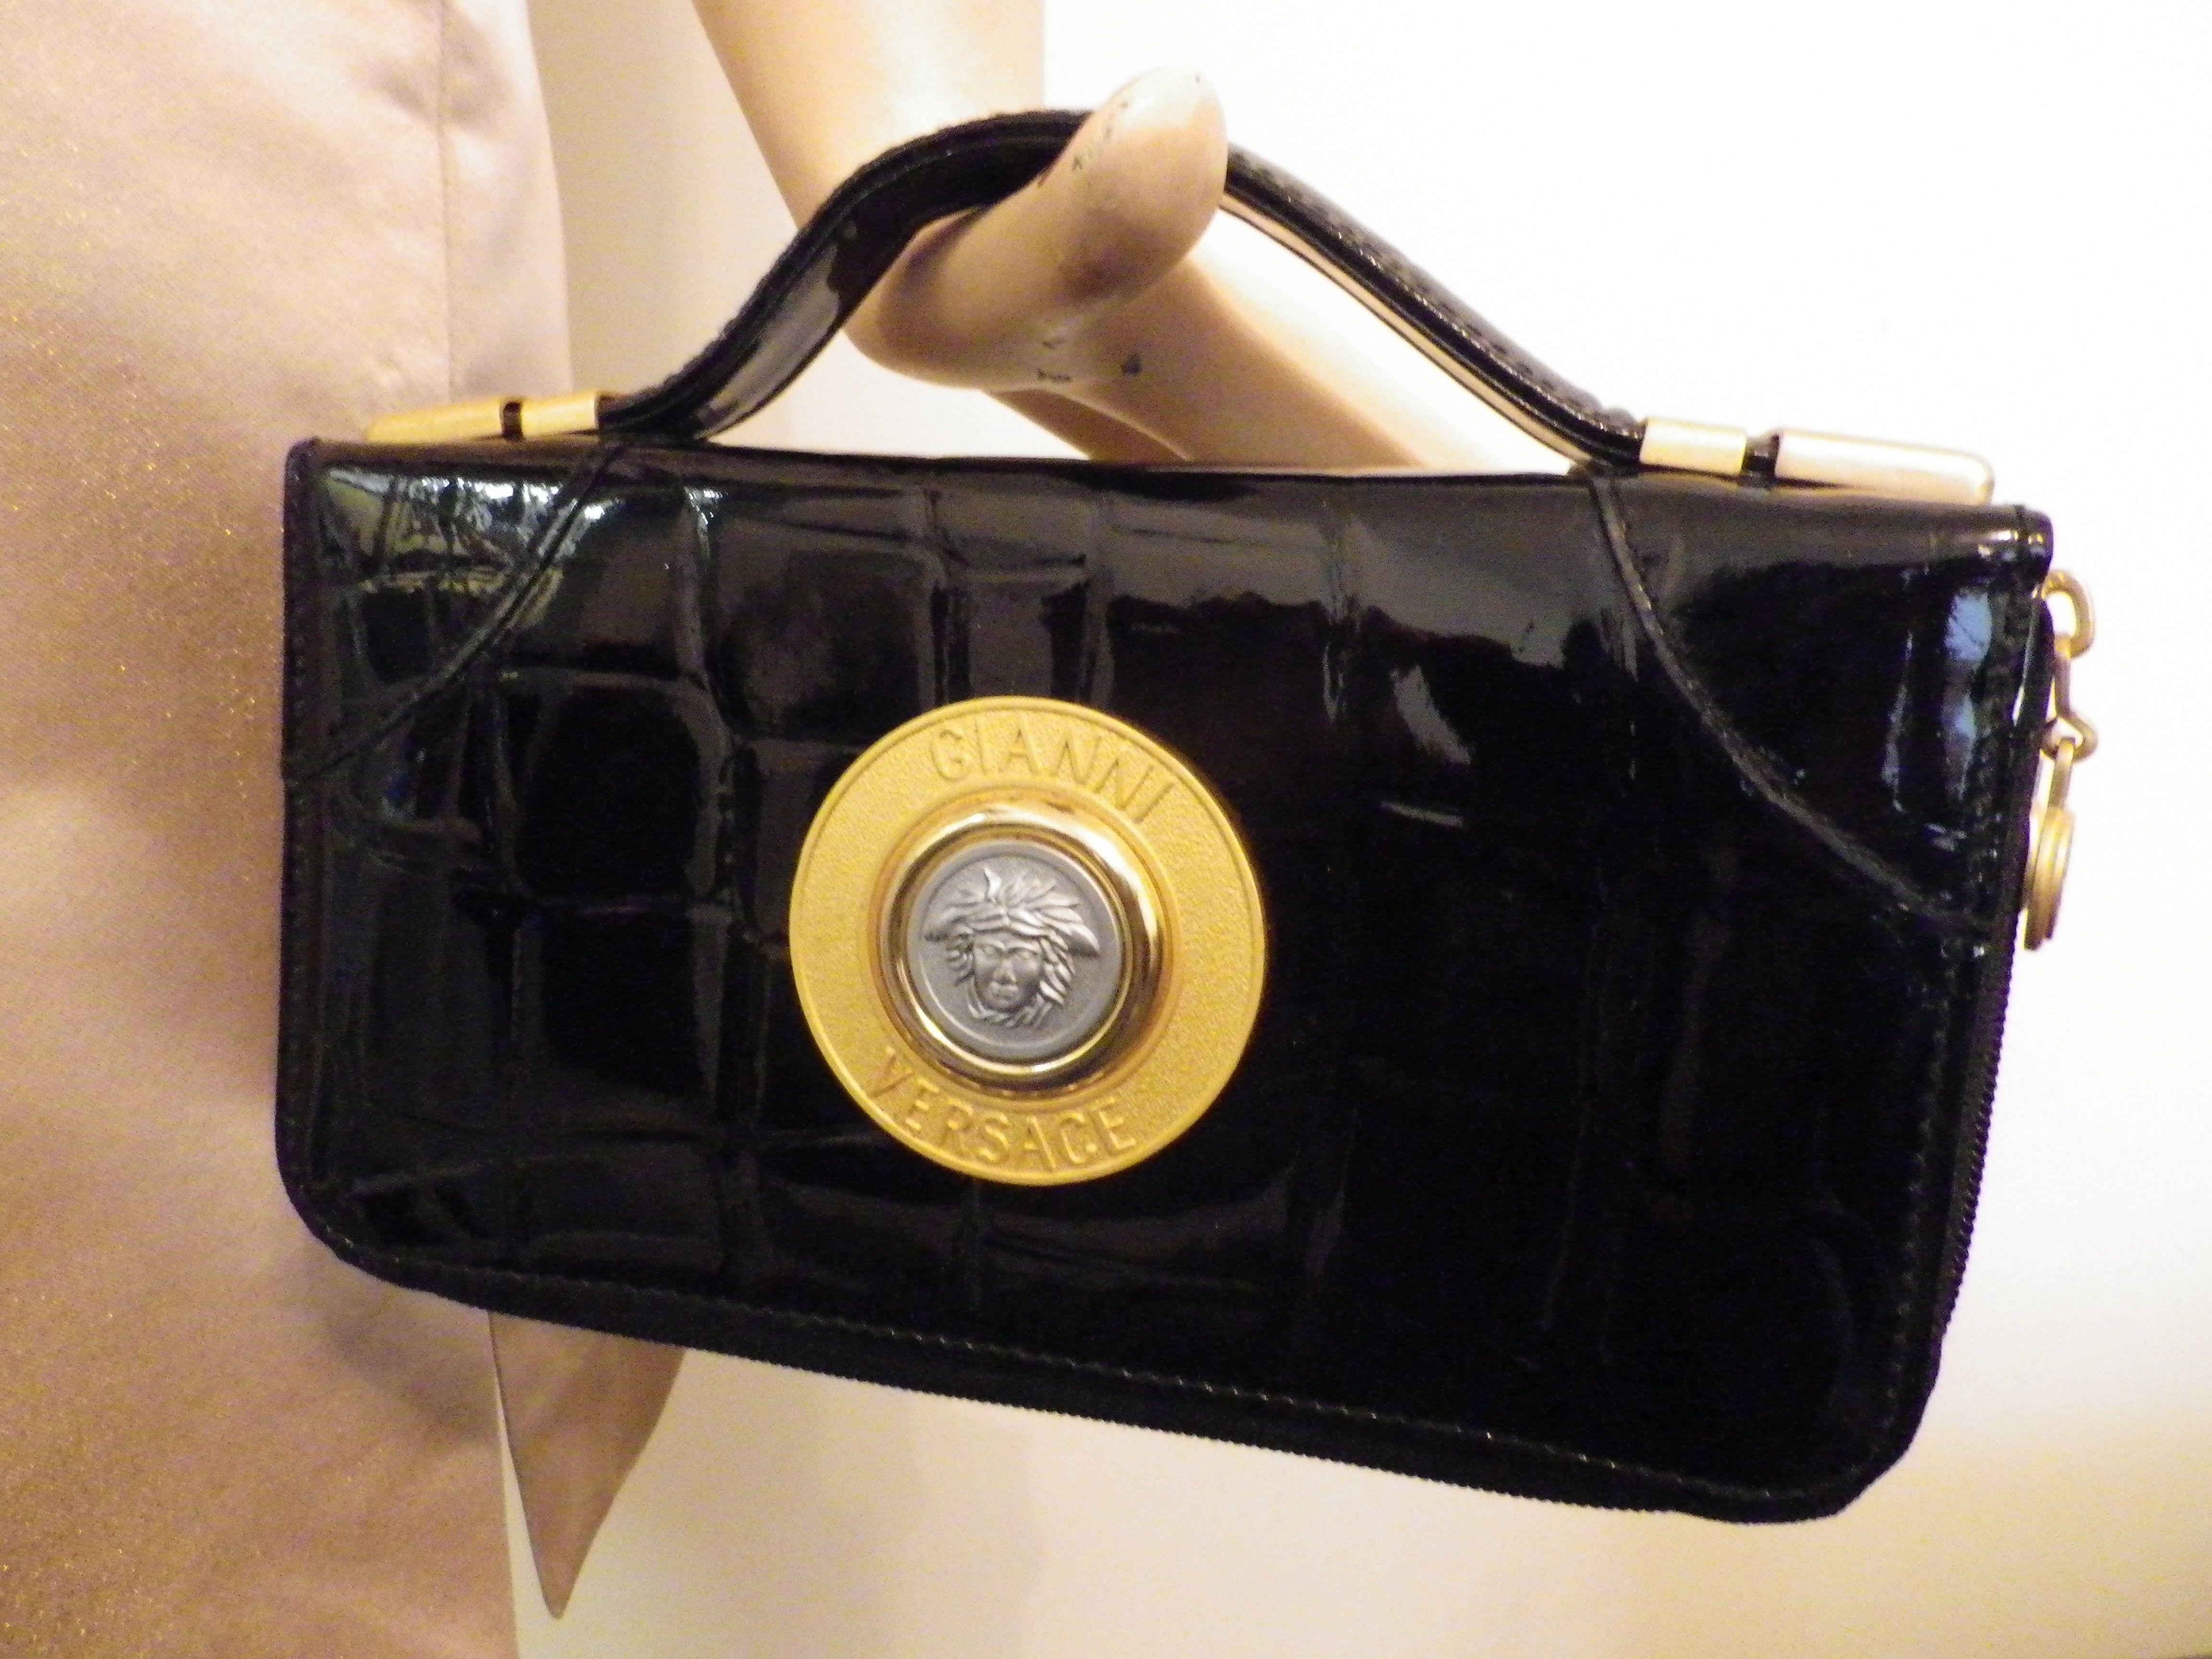 681afeb514 Gianni versace 80s moc croc clutch bag | Gianni Versace 80s & 90s ...